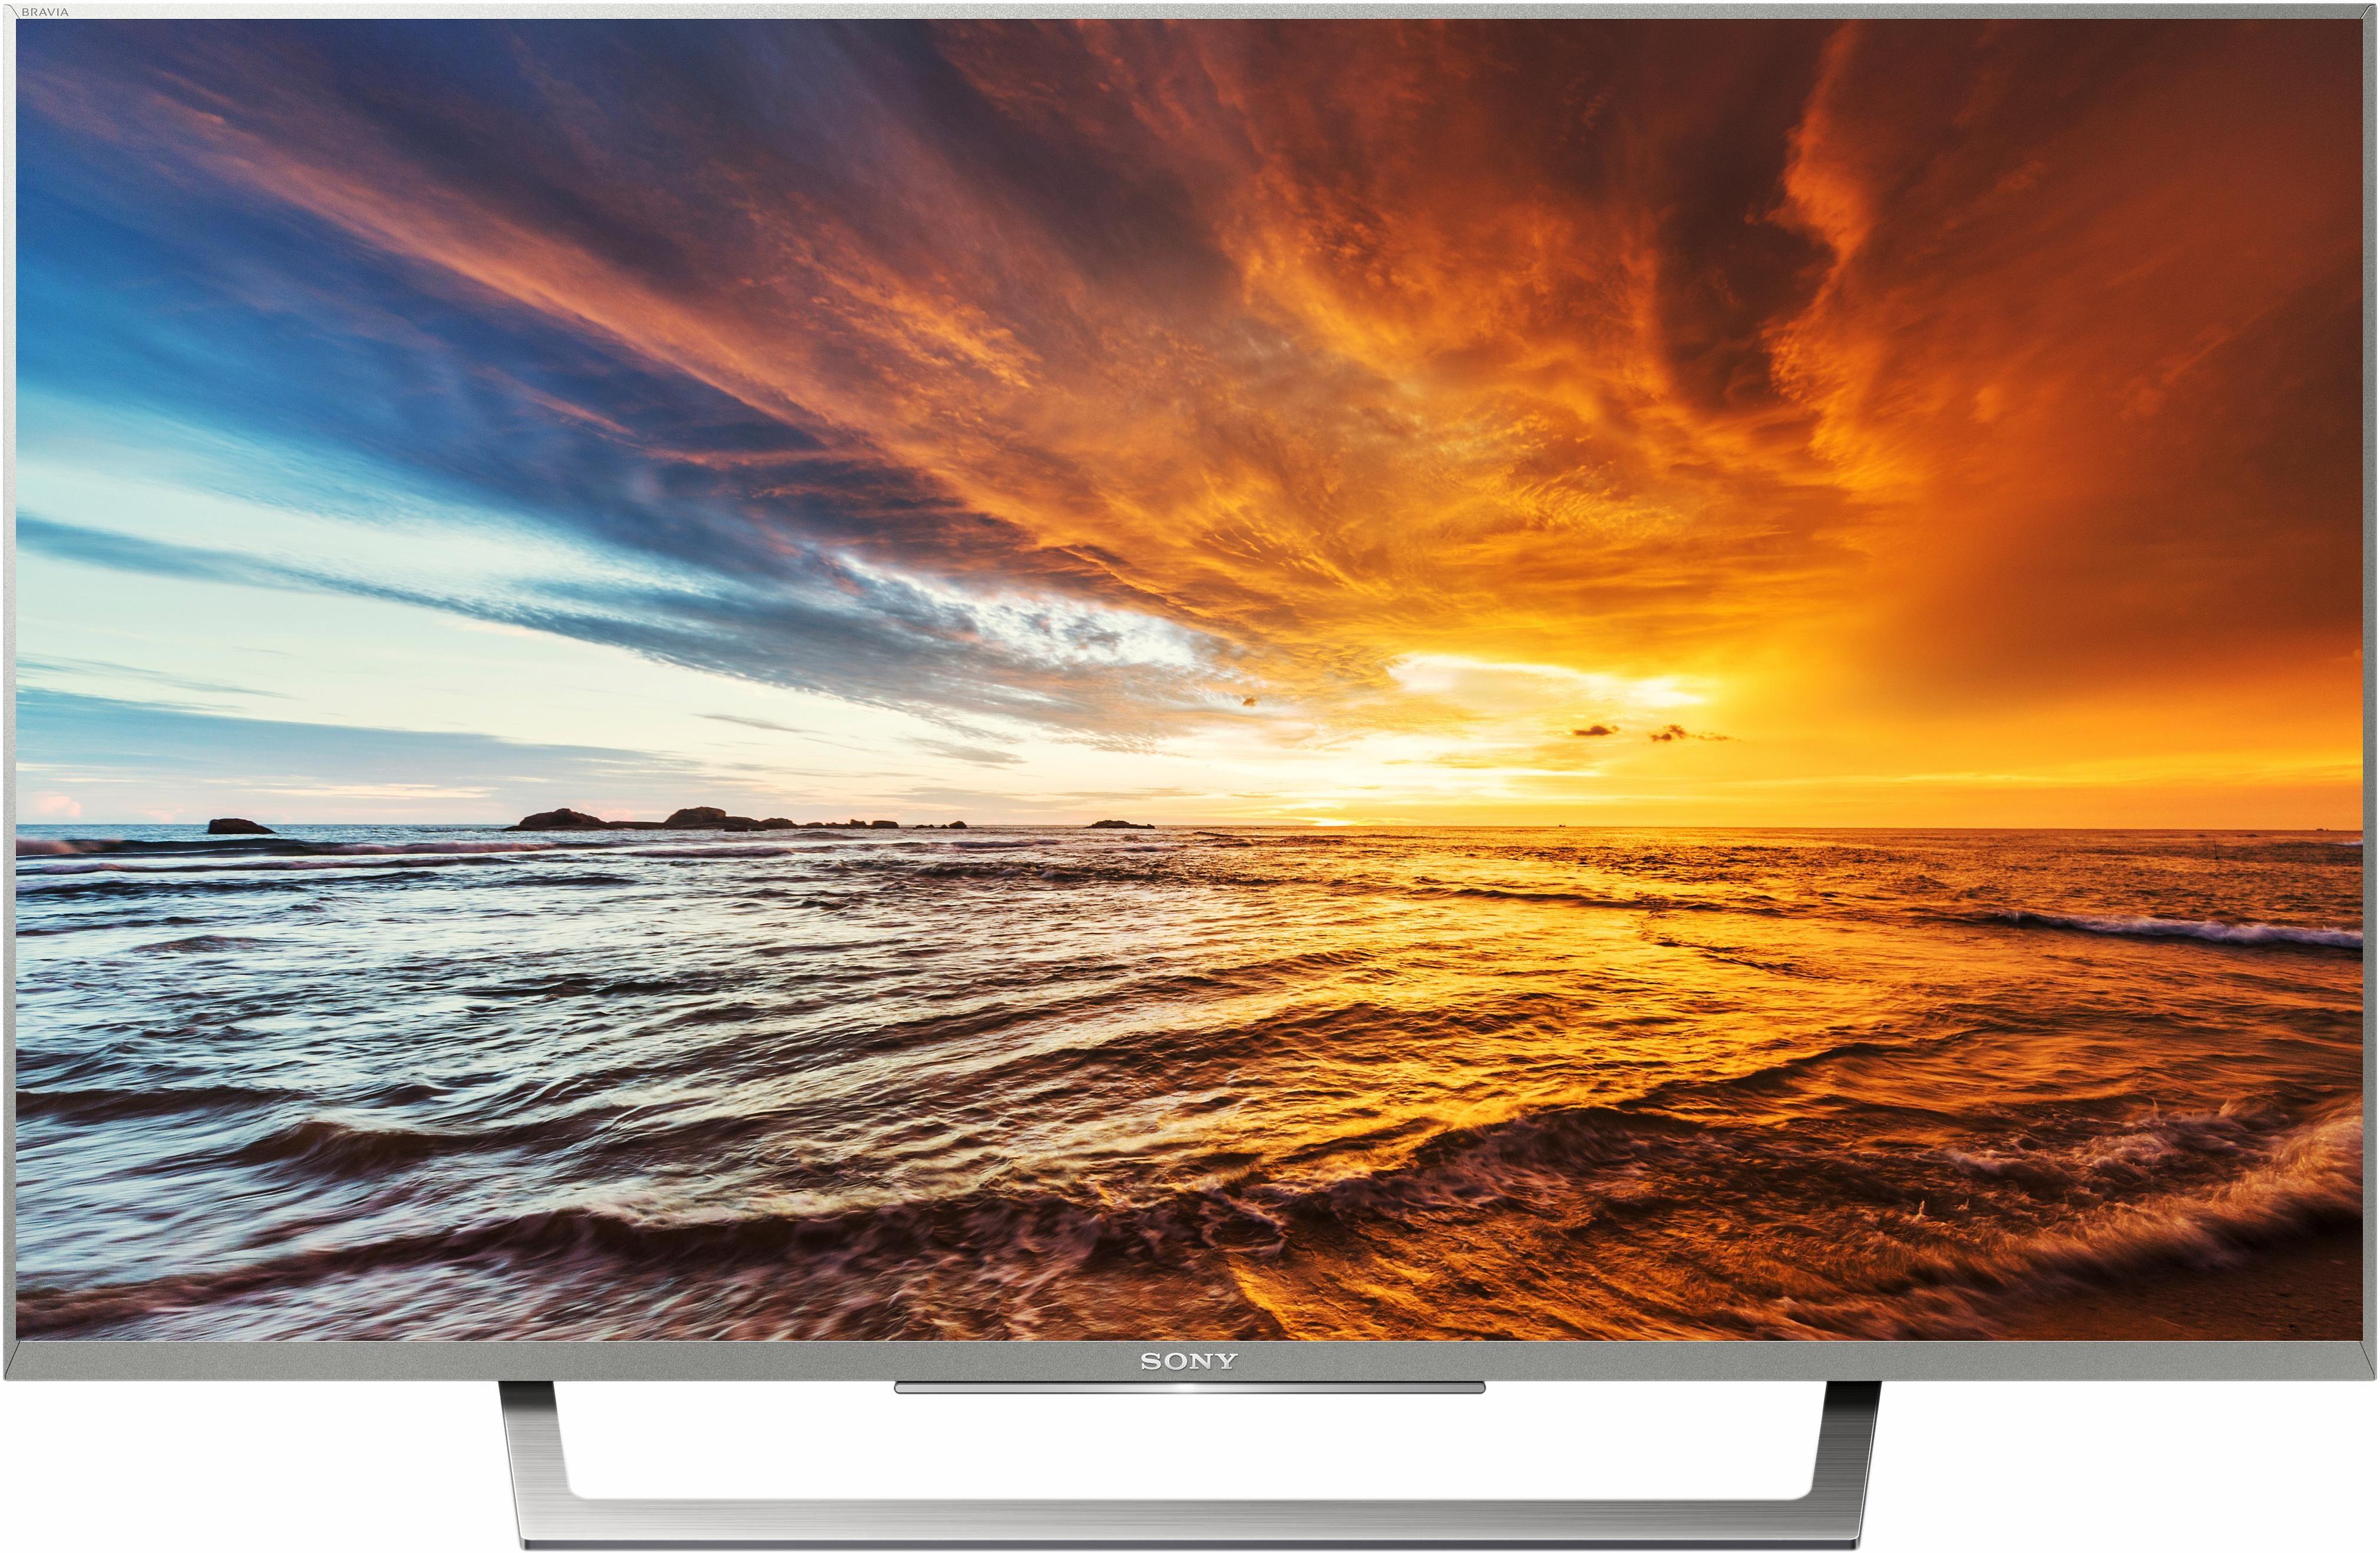 Sony KDL-32WD757, LED Fernseher, 80 cm (32 Zoll), 1080p (Full HD), Smart-TV